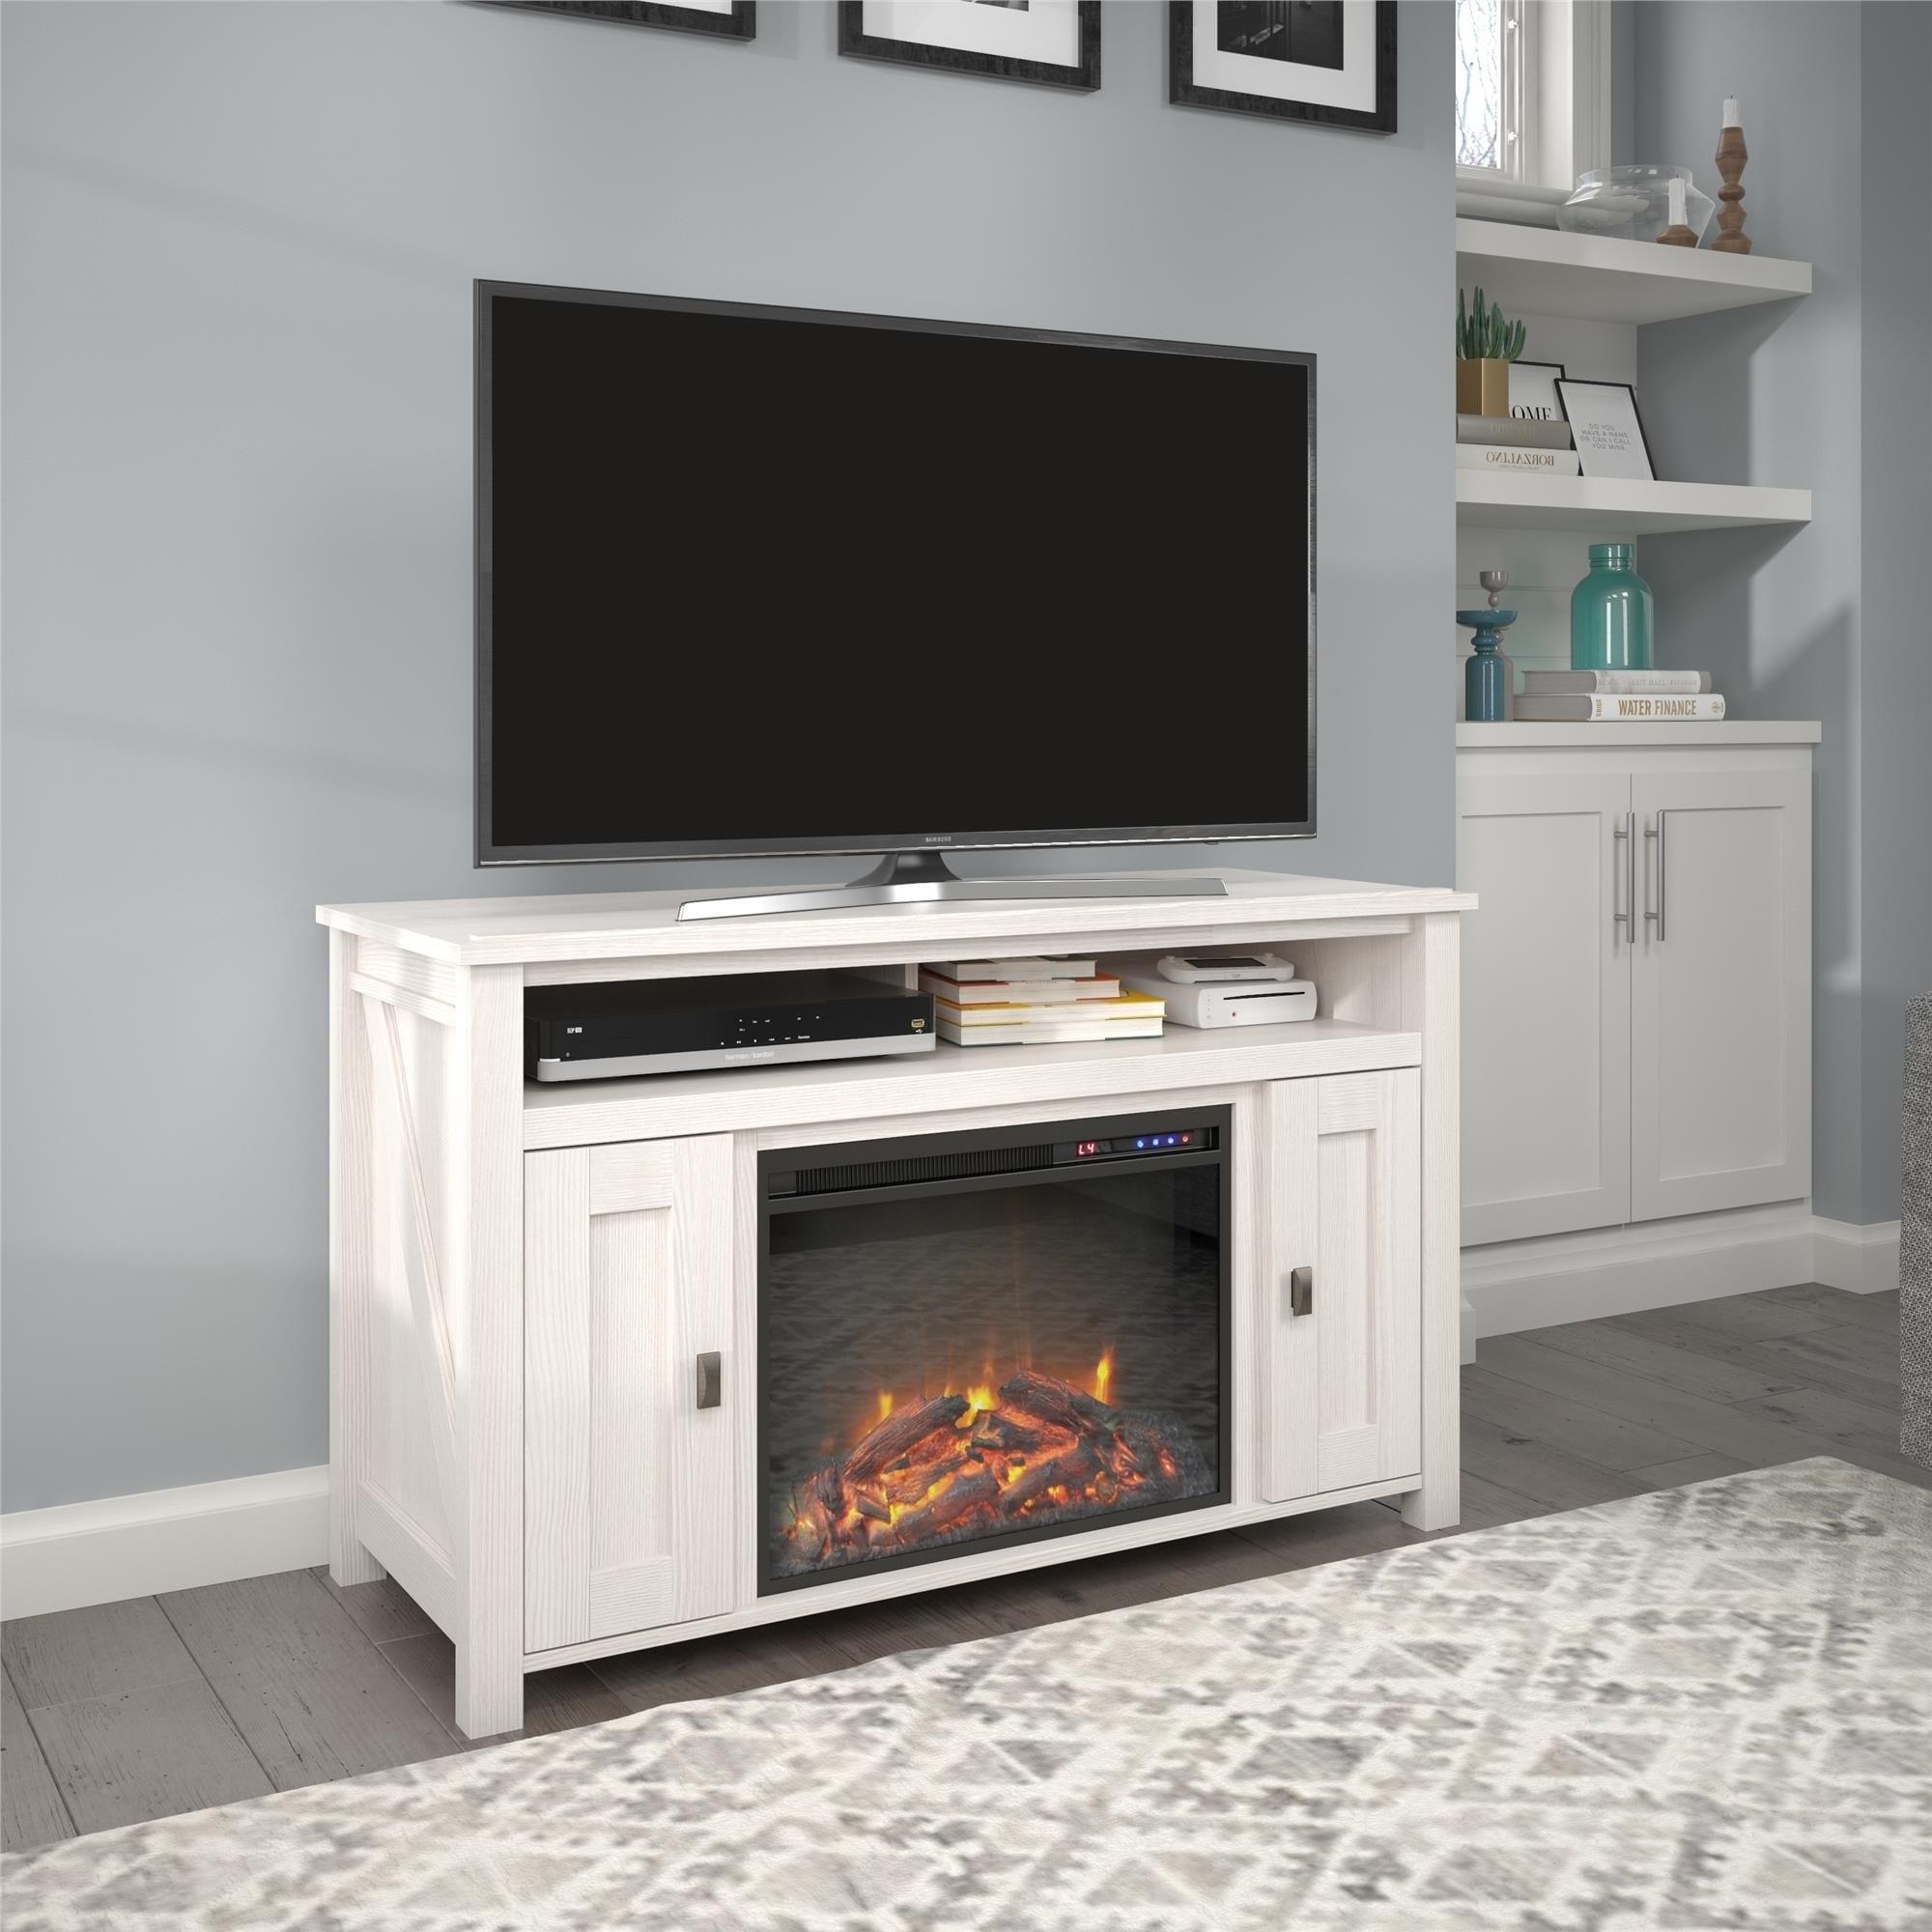 Shop Avenue Greene Becken Ridge Electric Fireplace Tv Console For